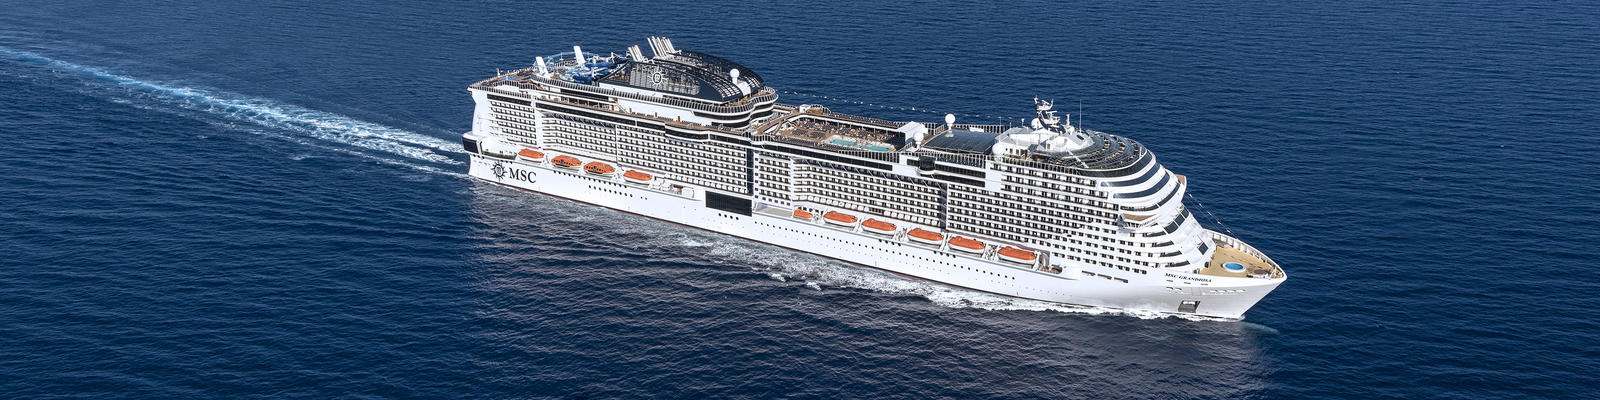 MSC Grandiosa Cruise Ship: Review, Photos & Departure ...